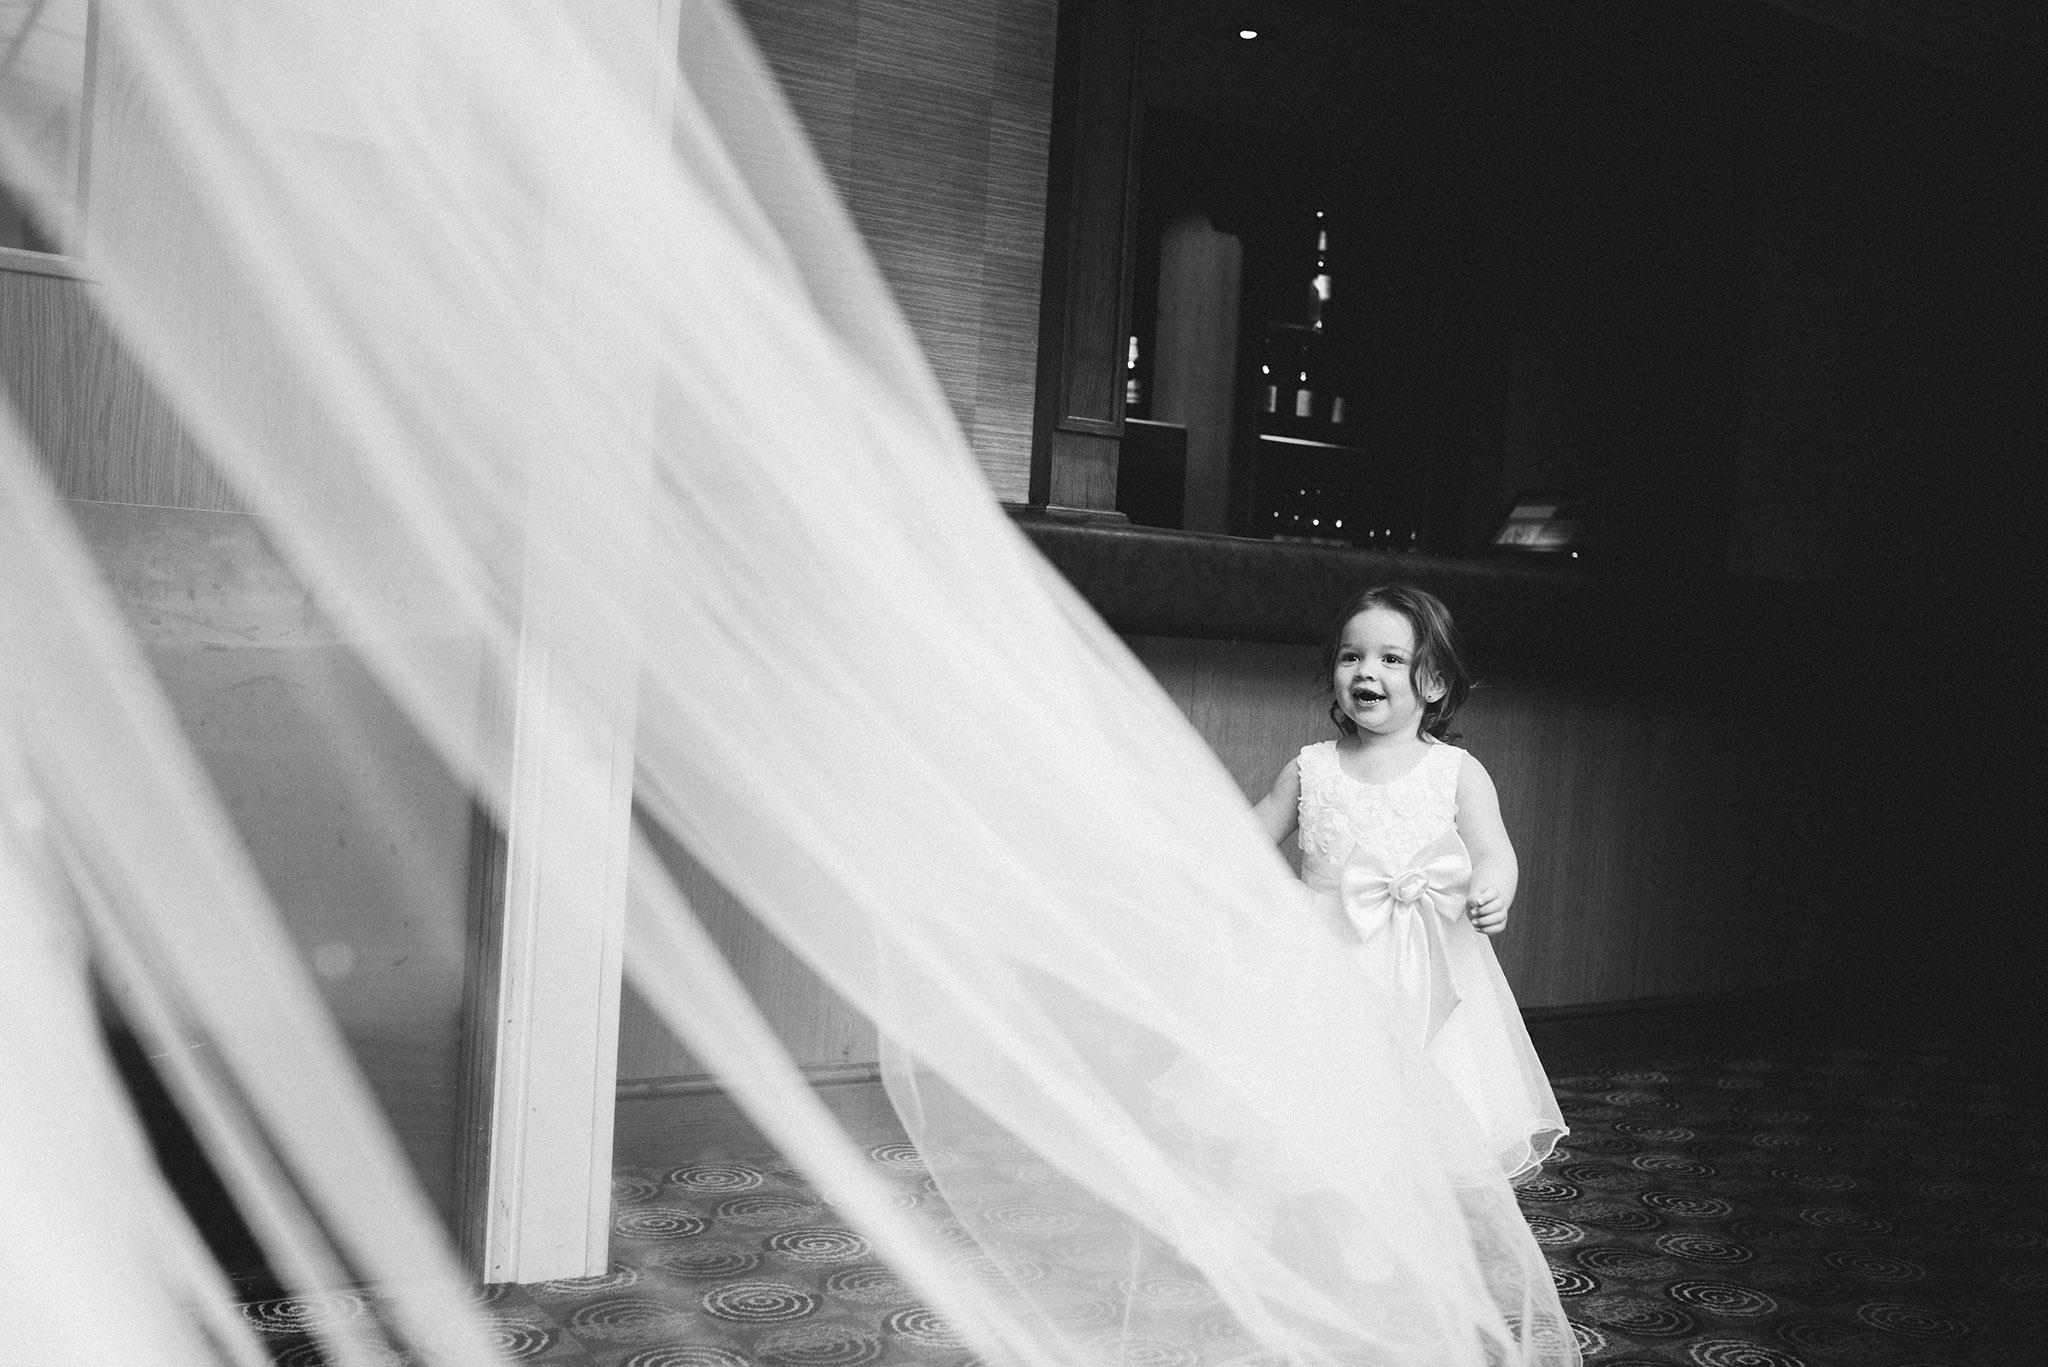 scott-stockwell-photography-wedding-20.jpg